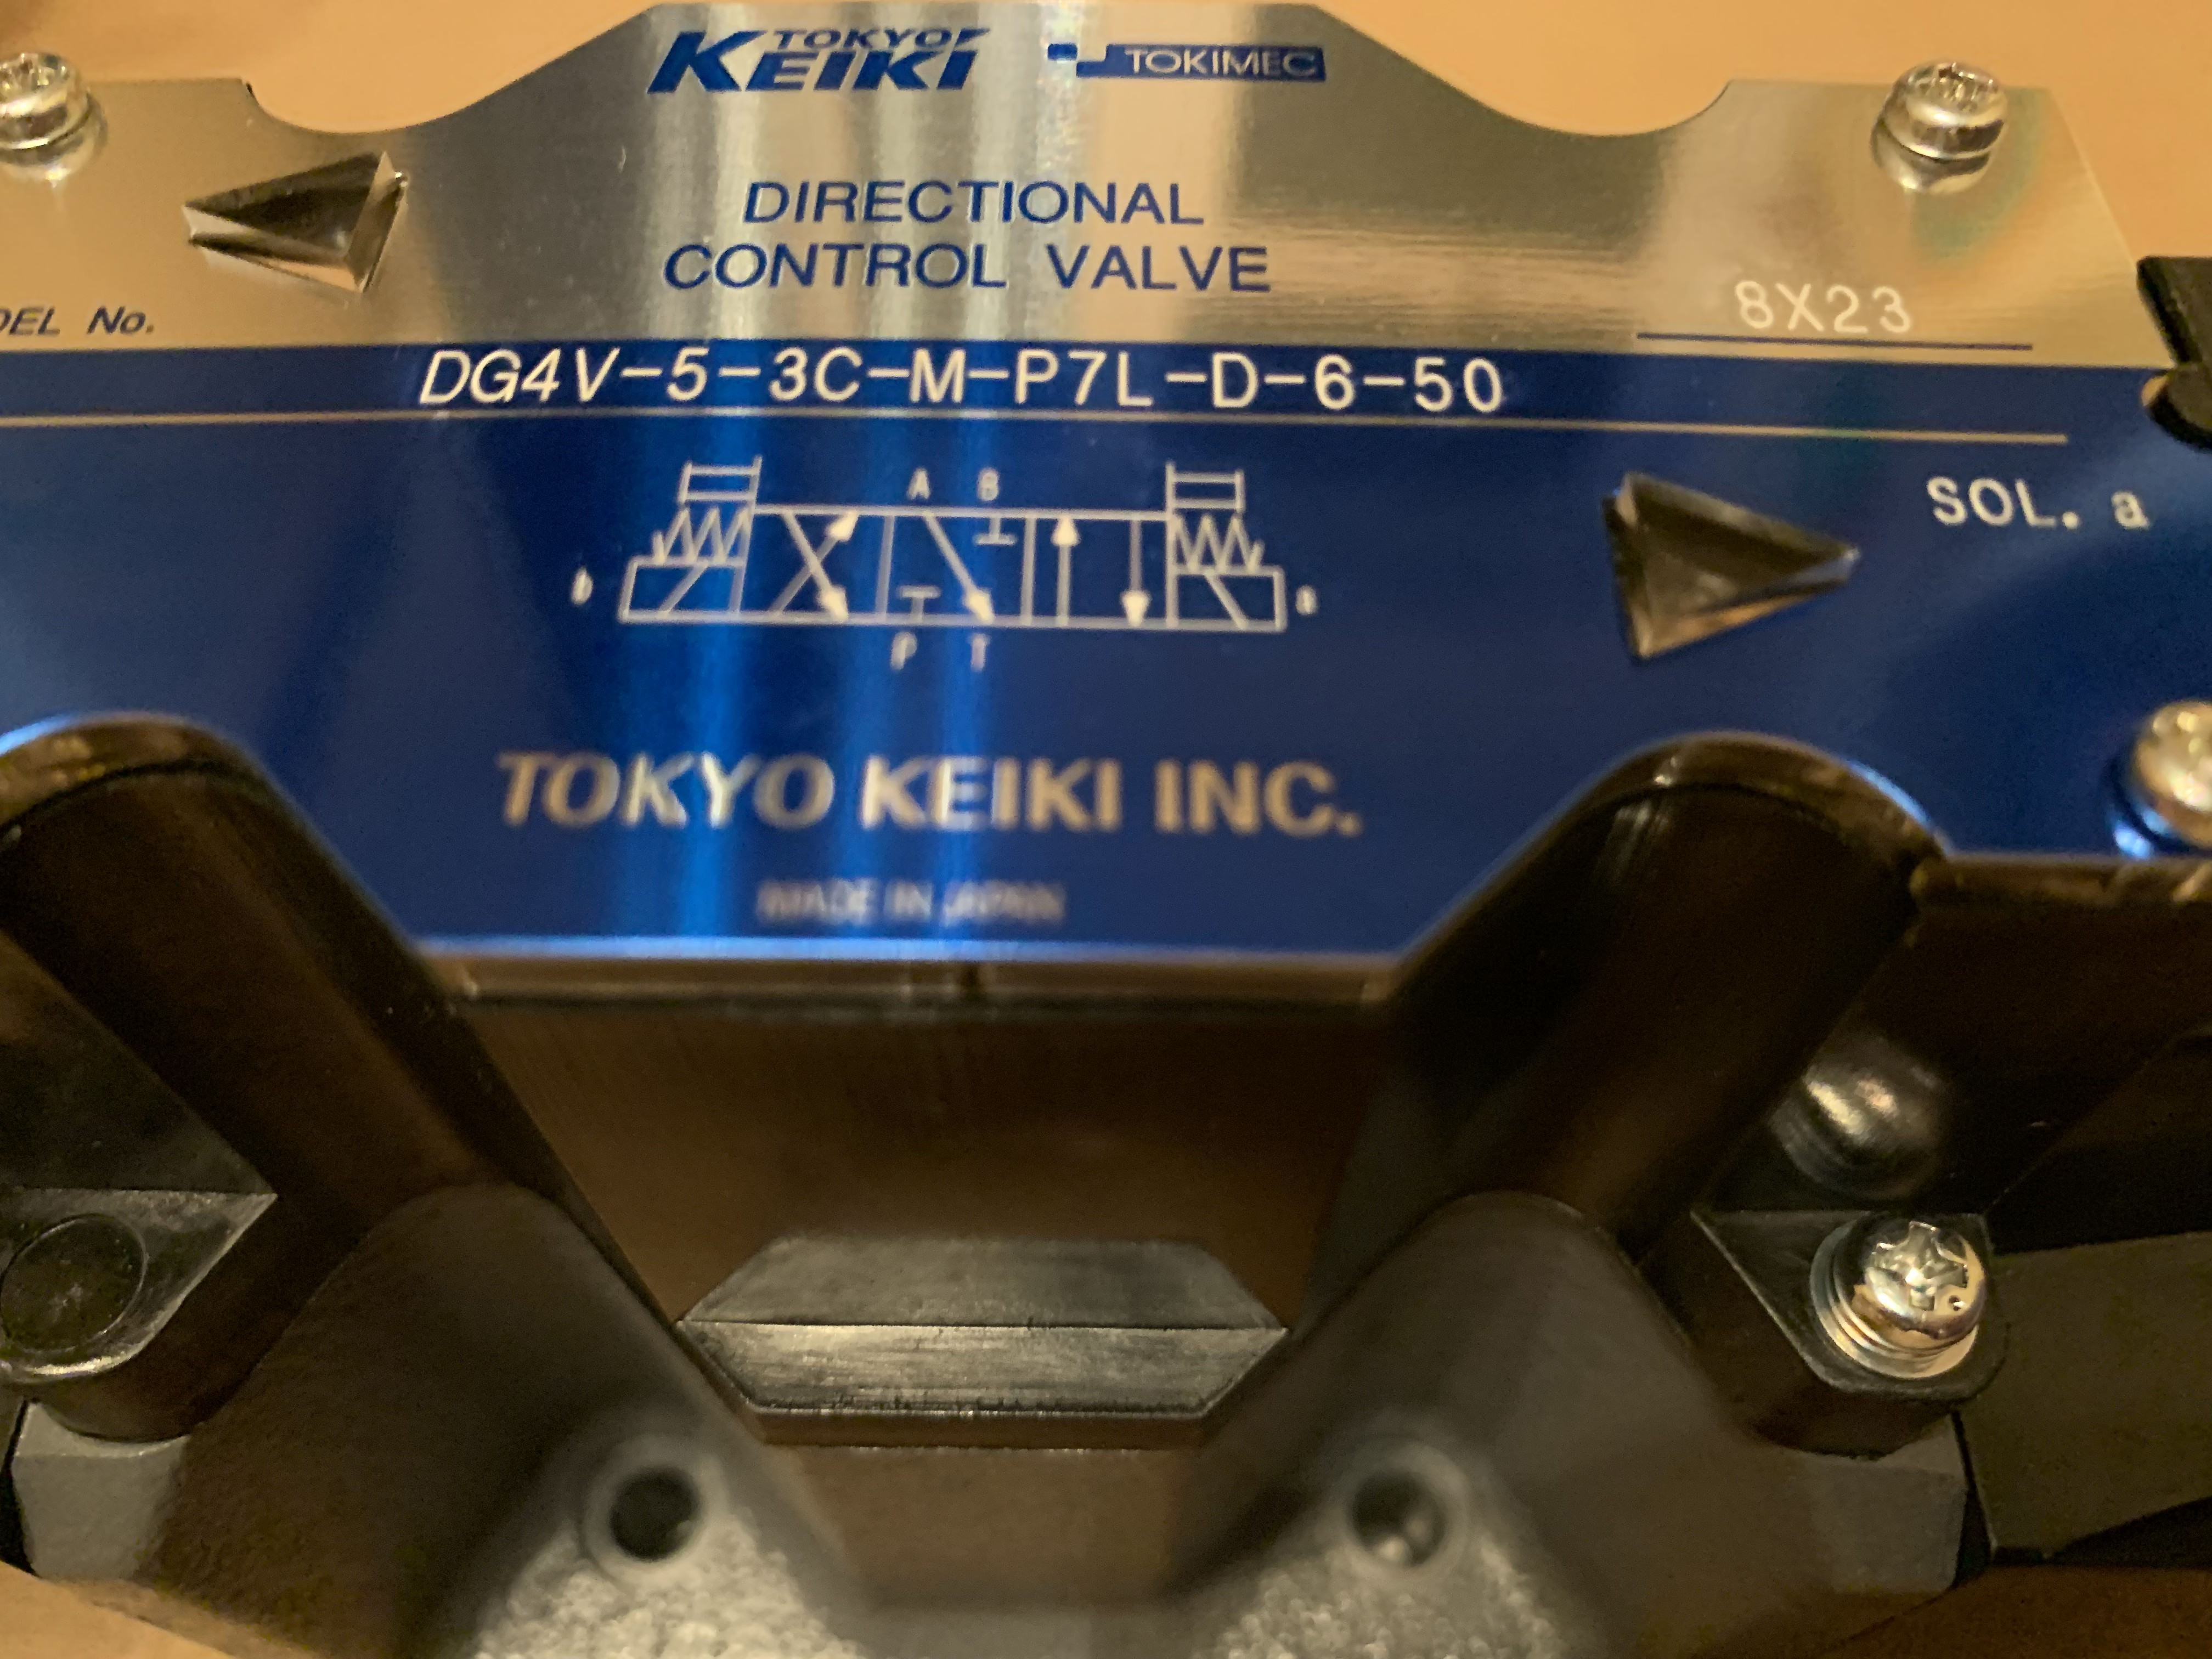 Клапан TOKIMEC (TOKYO KEIKI) DG4V-5-3C-M-P7L-D-6-50